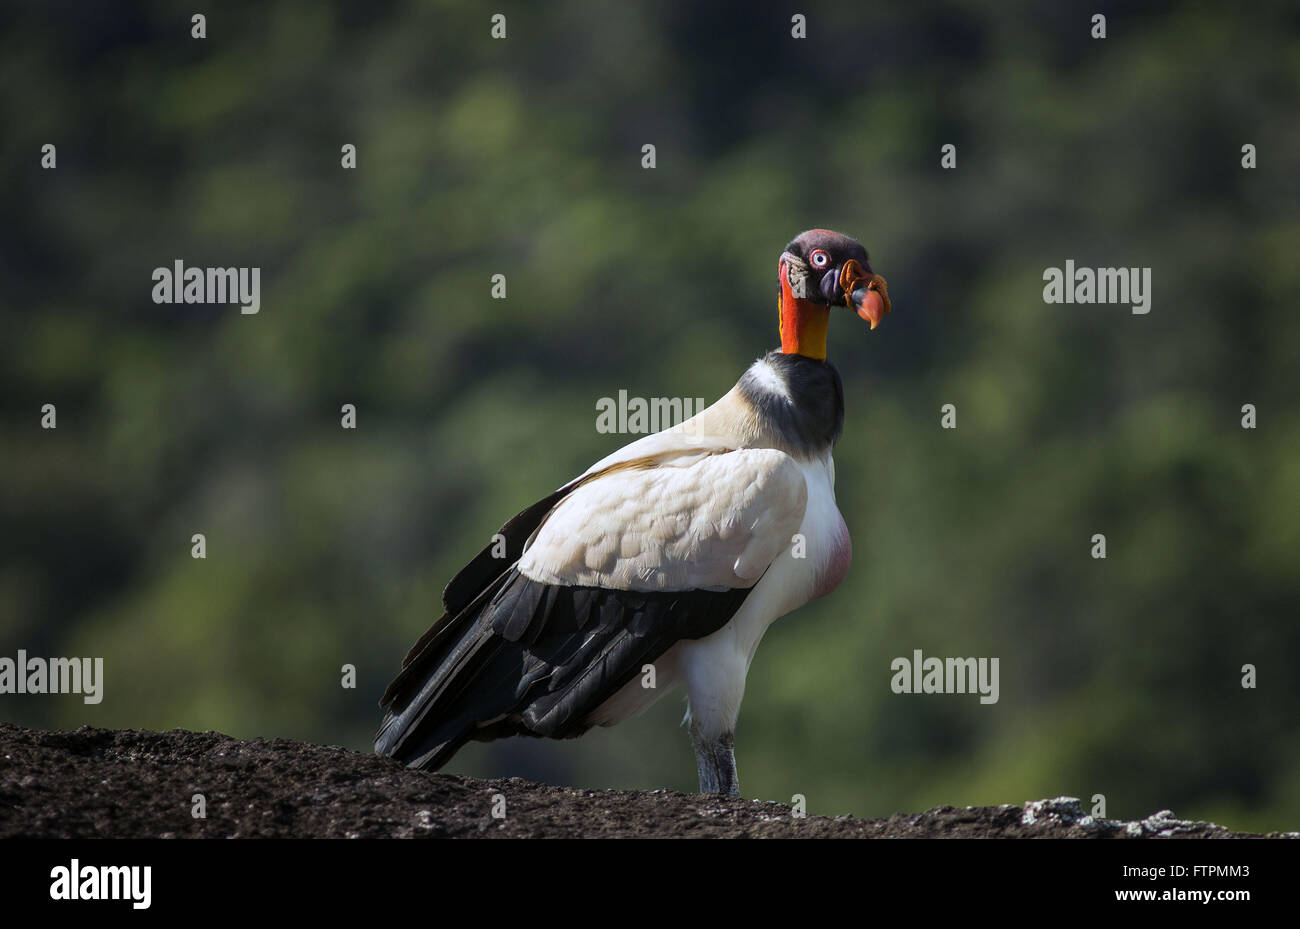 King Vulture Sierra Araraquara